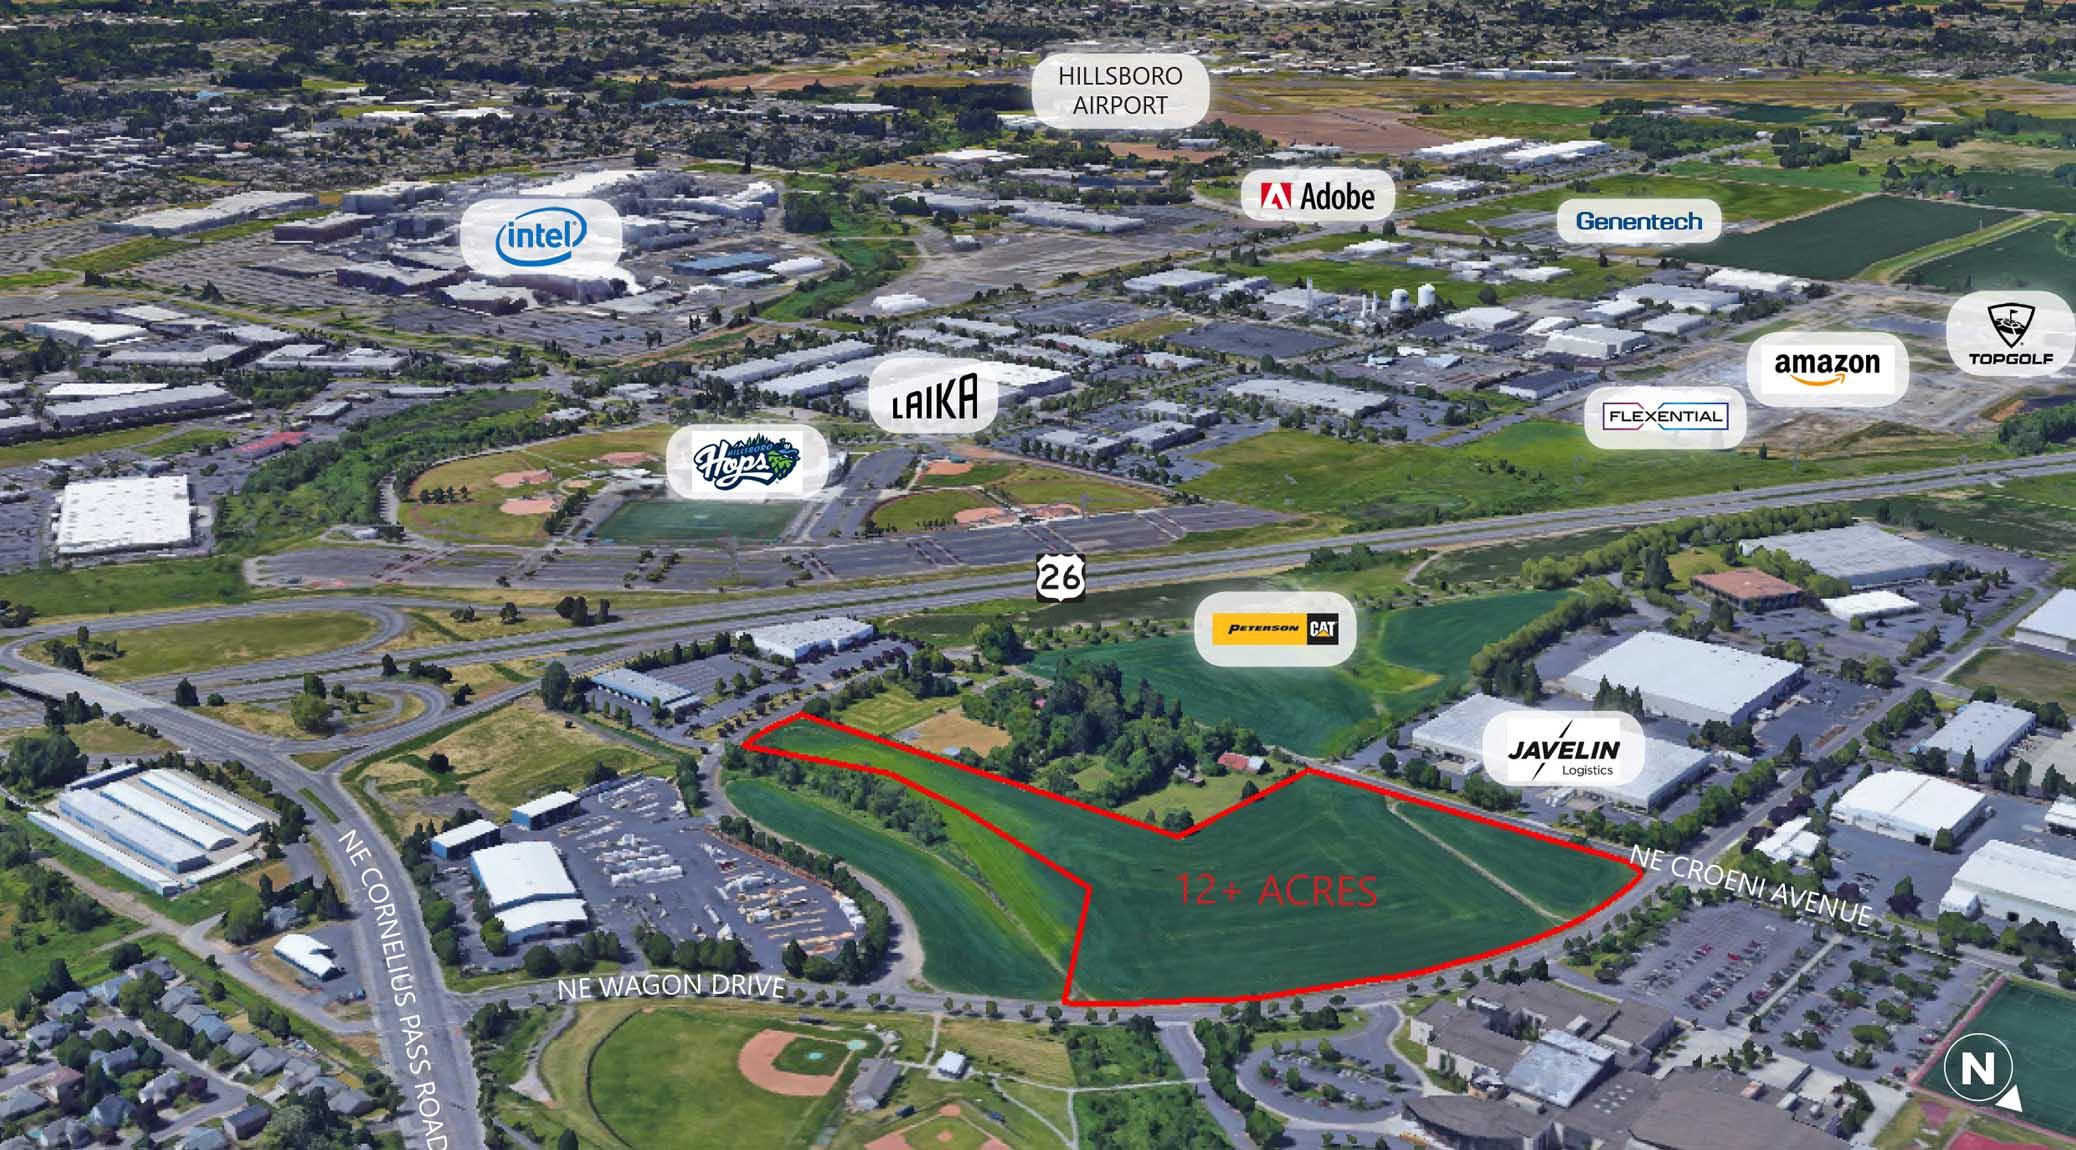 5 Oaks Hillsboro industrial building site